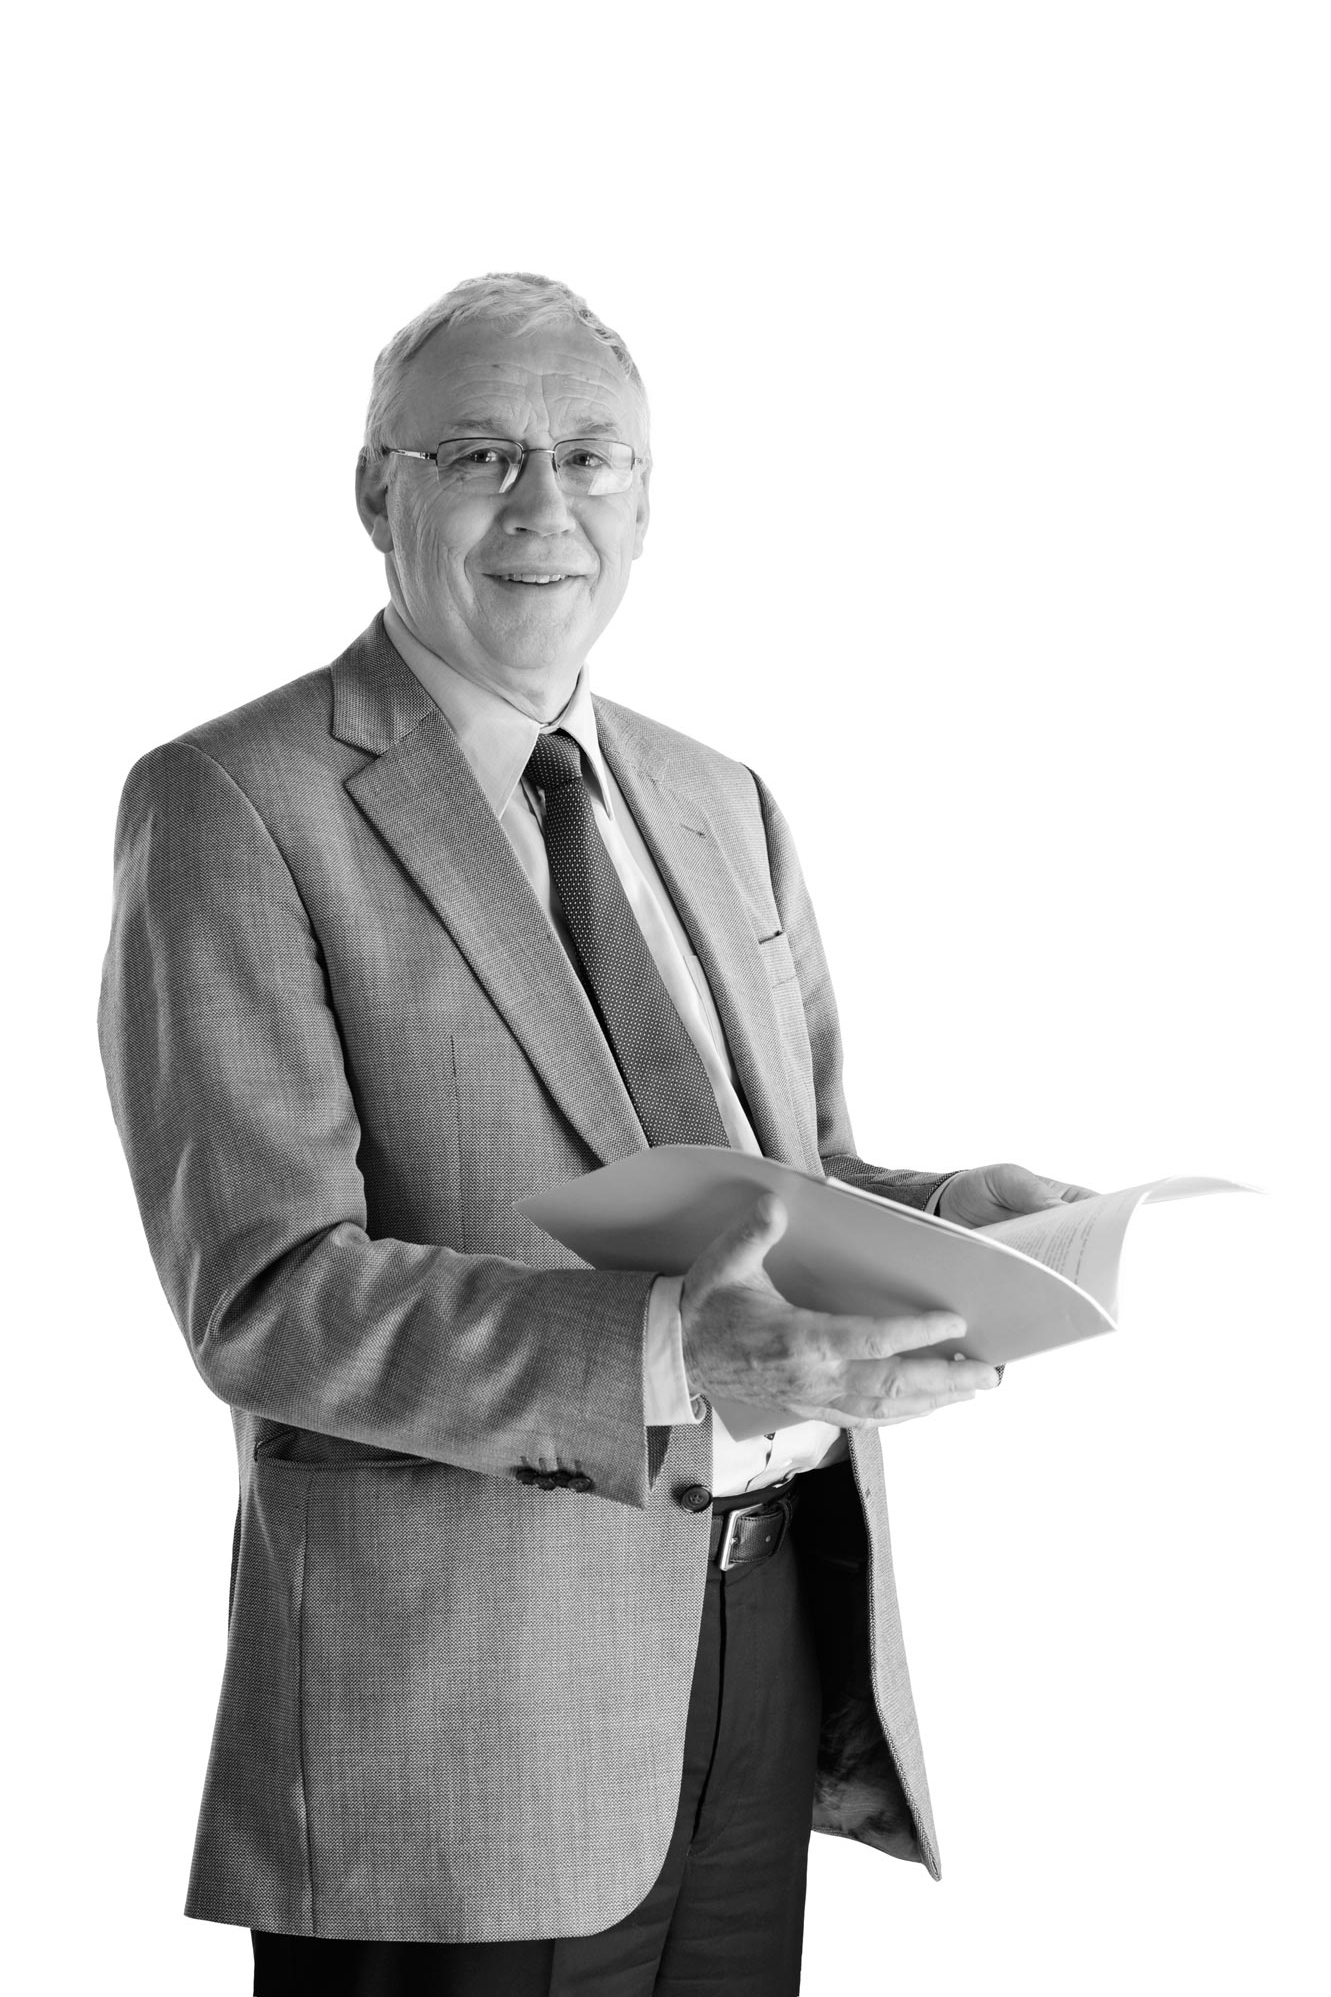 Bernard Louveaux    Vastgoed- en bouwrecht Stedenbouw- en milieurecht     T  +32 (0)2 501 61 22  F  +32 (0)2 514 22 31  E :   b.louveaux@wery.legal